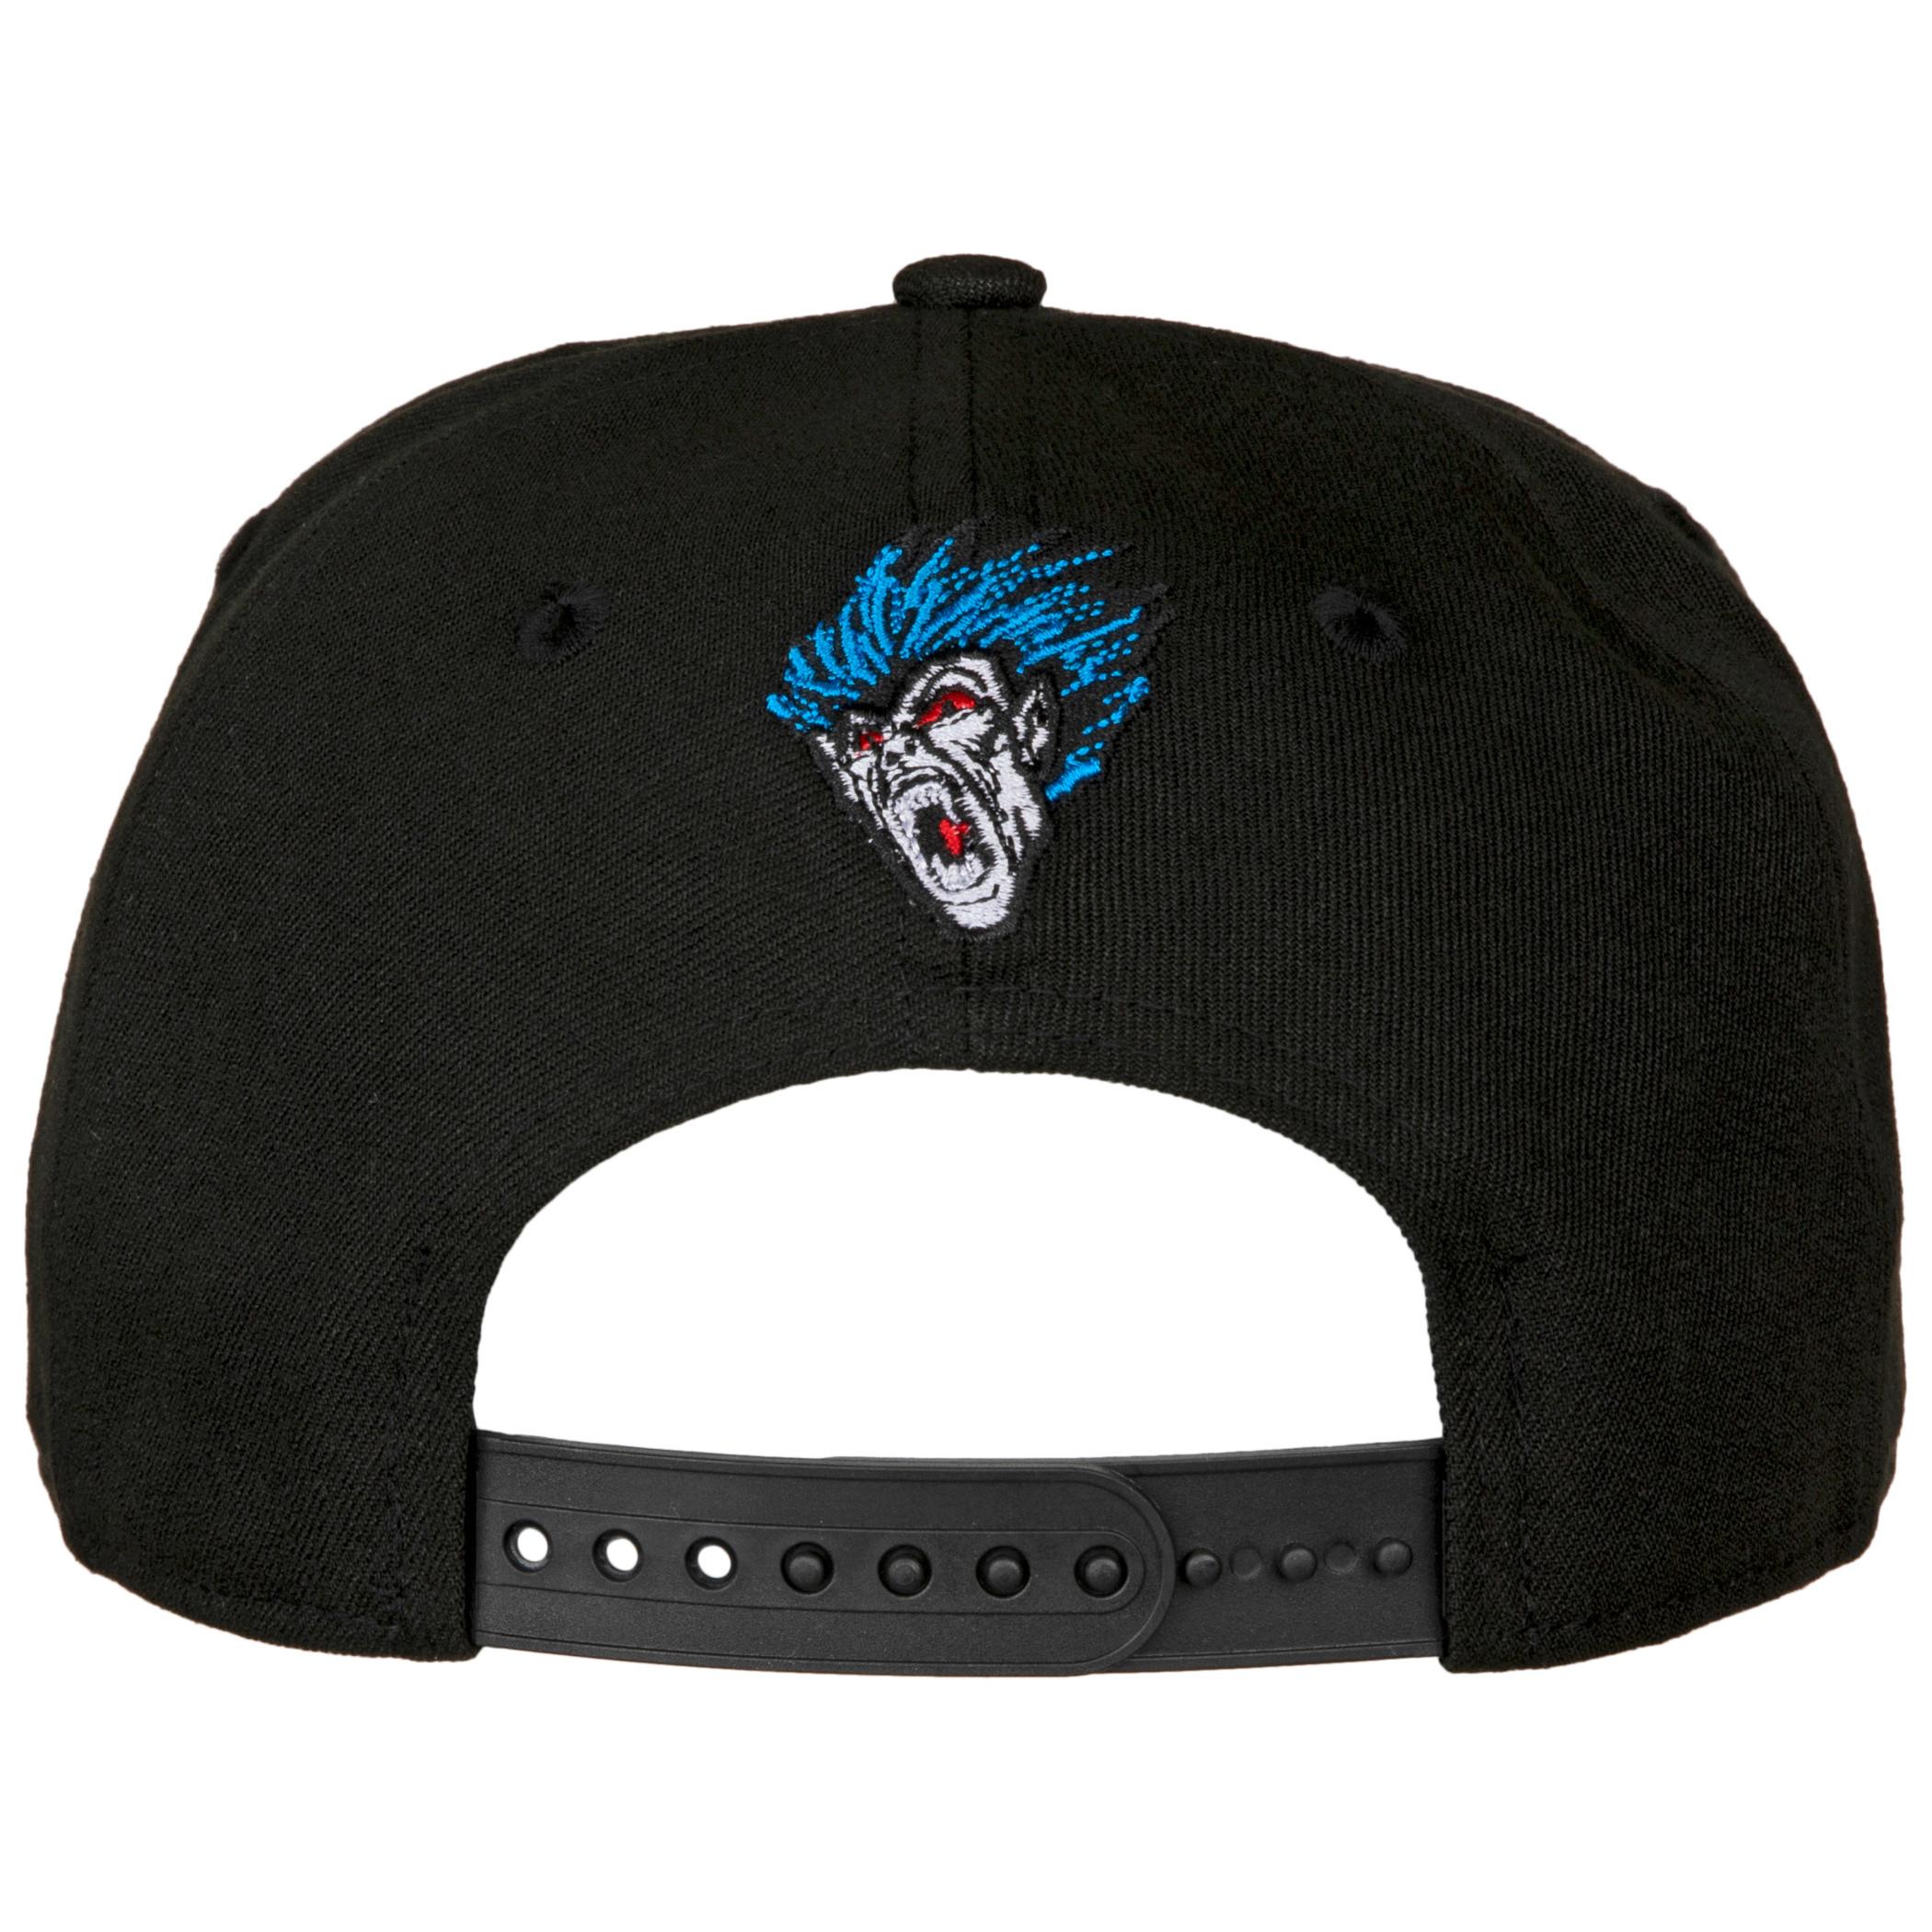 Morbius The Living Vampire Bleeding Logo New Era 9Fifty Adjustable Hat